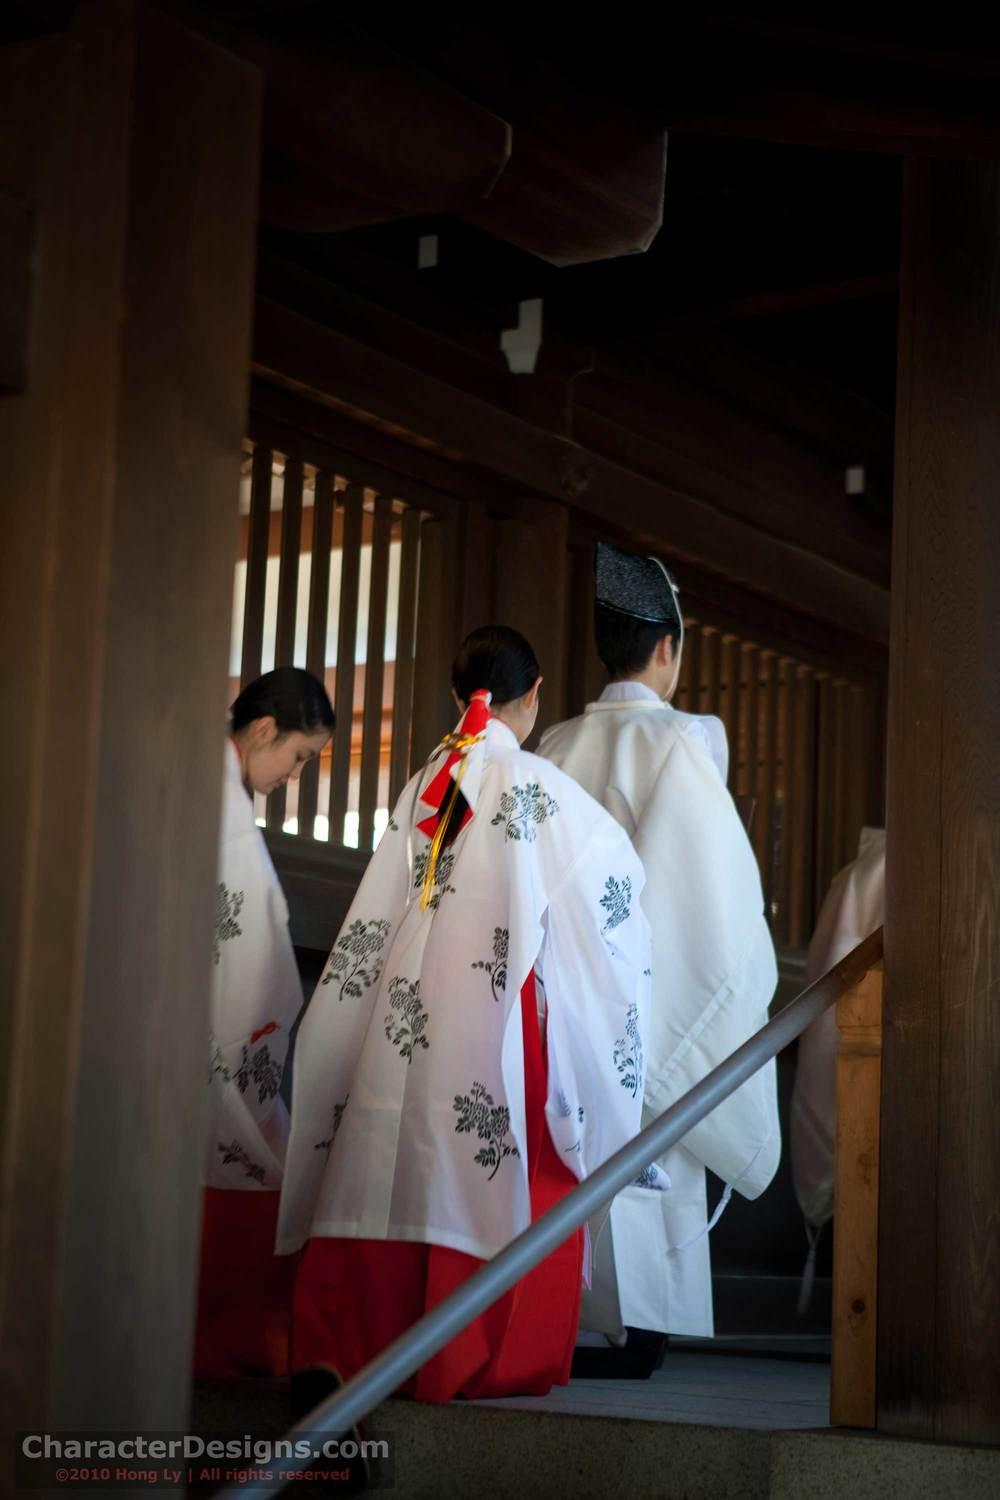 2010_Japan_Image_068.jpg